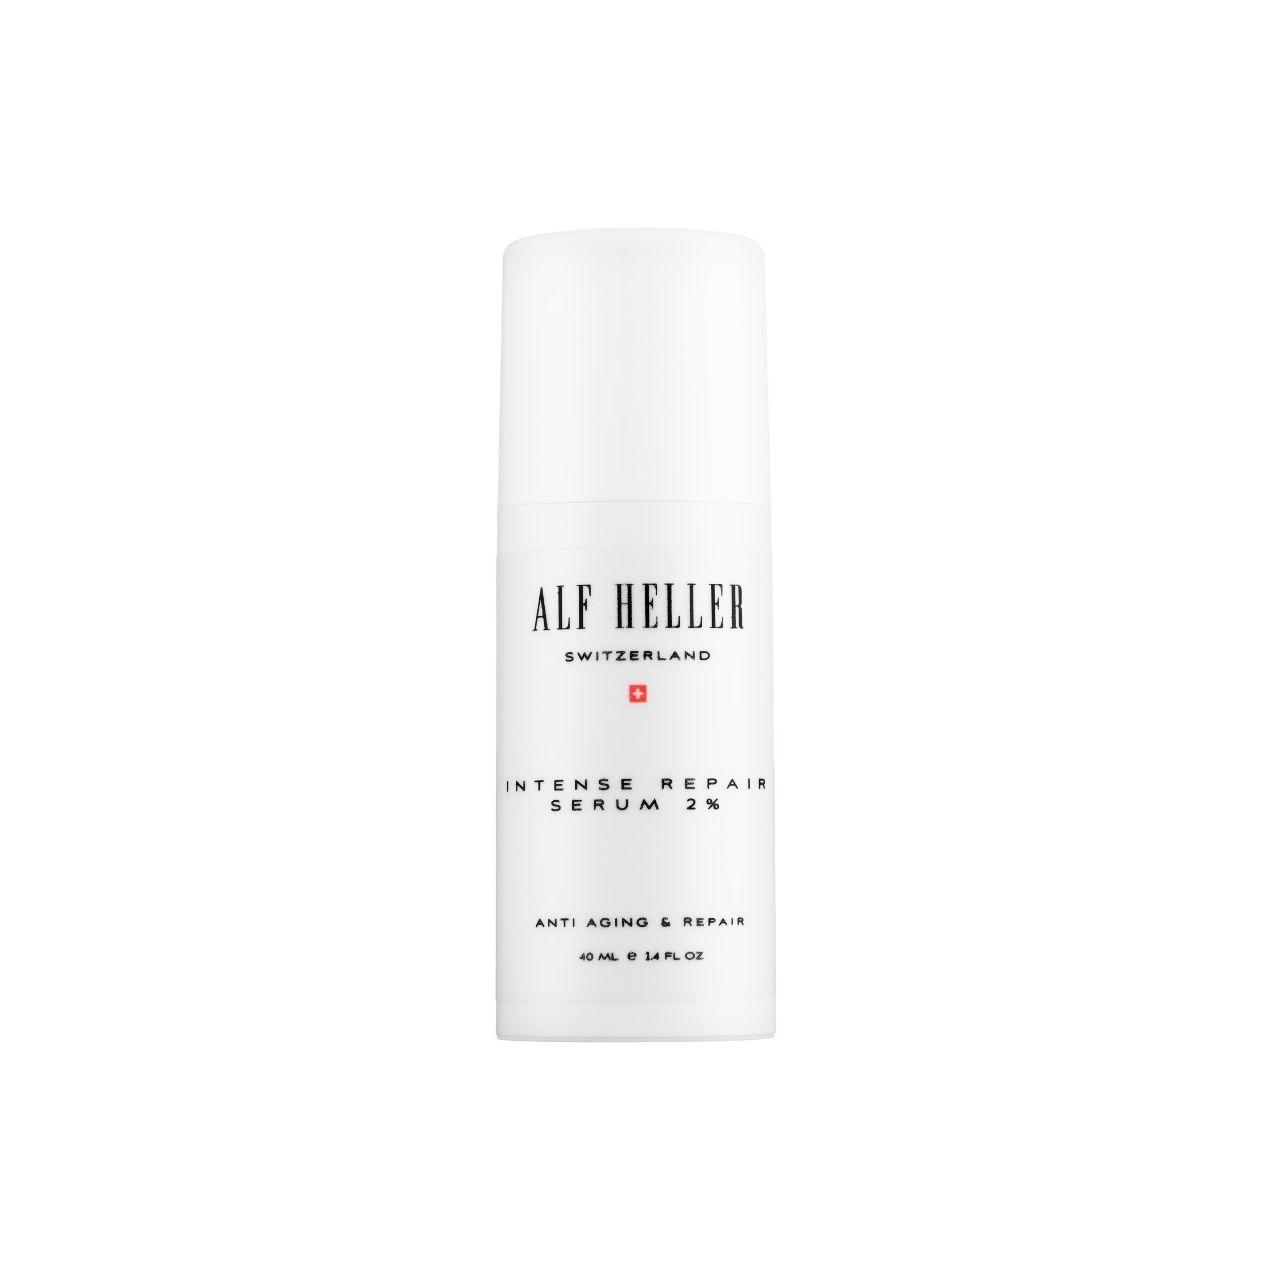 Alf Heller Switzerland-INTENSE REPAIR SERUM 2%